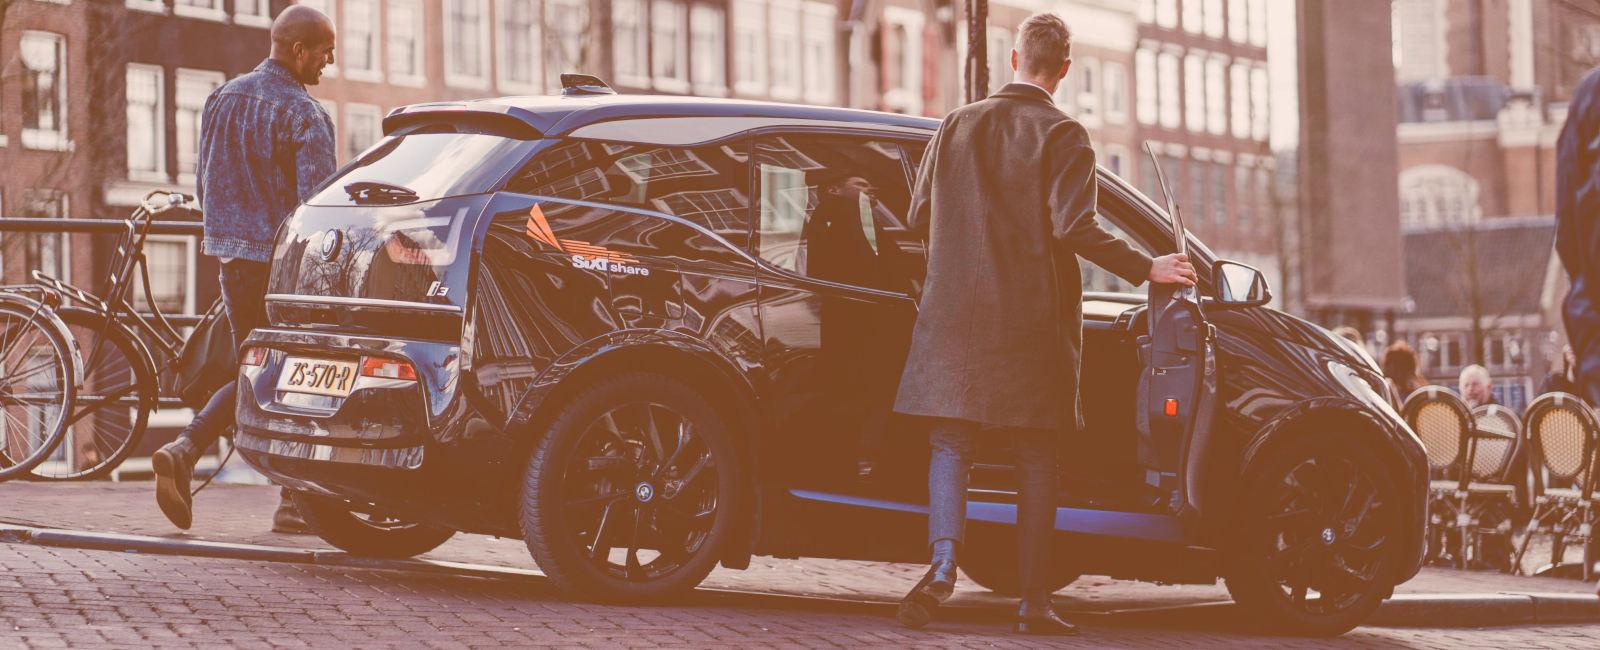 sixt share carsharing algemene voorwaarden 1